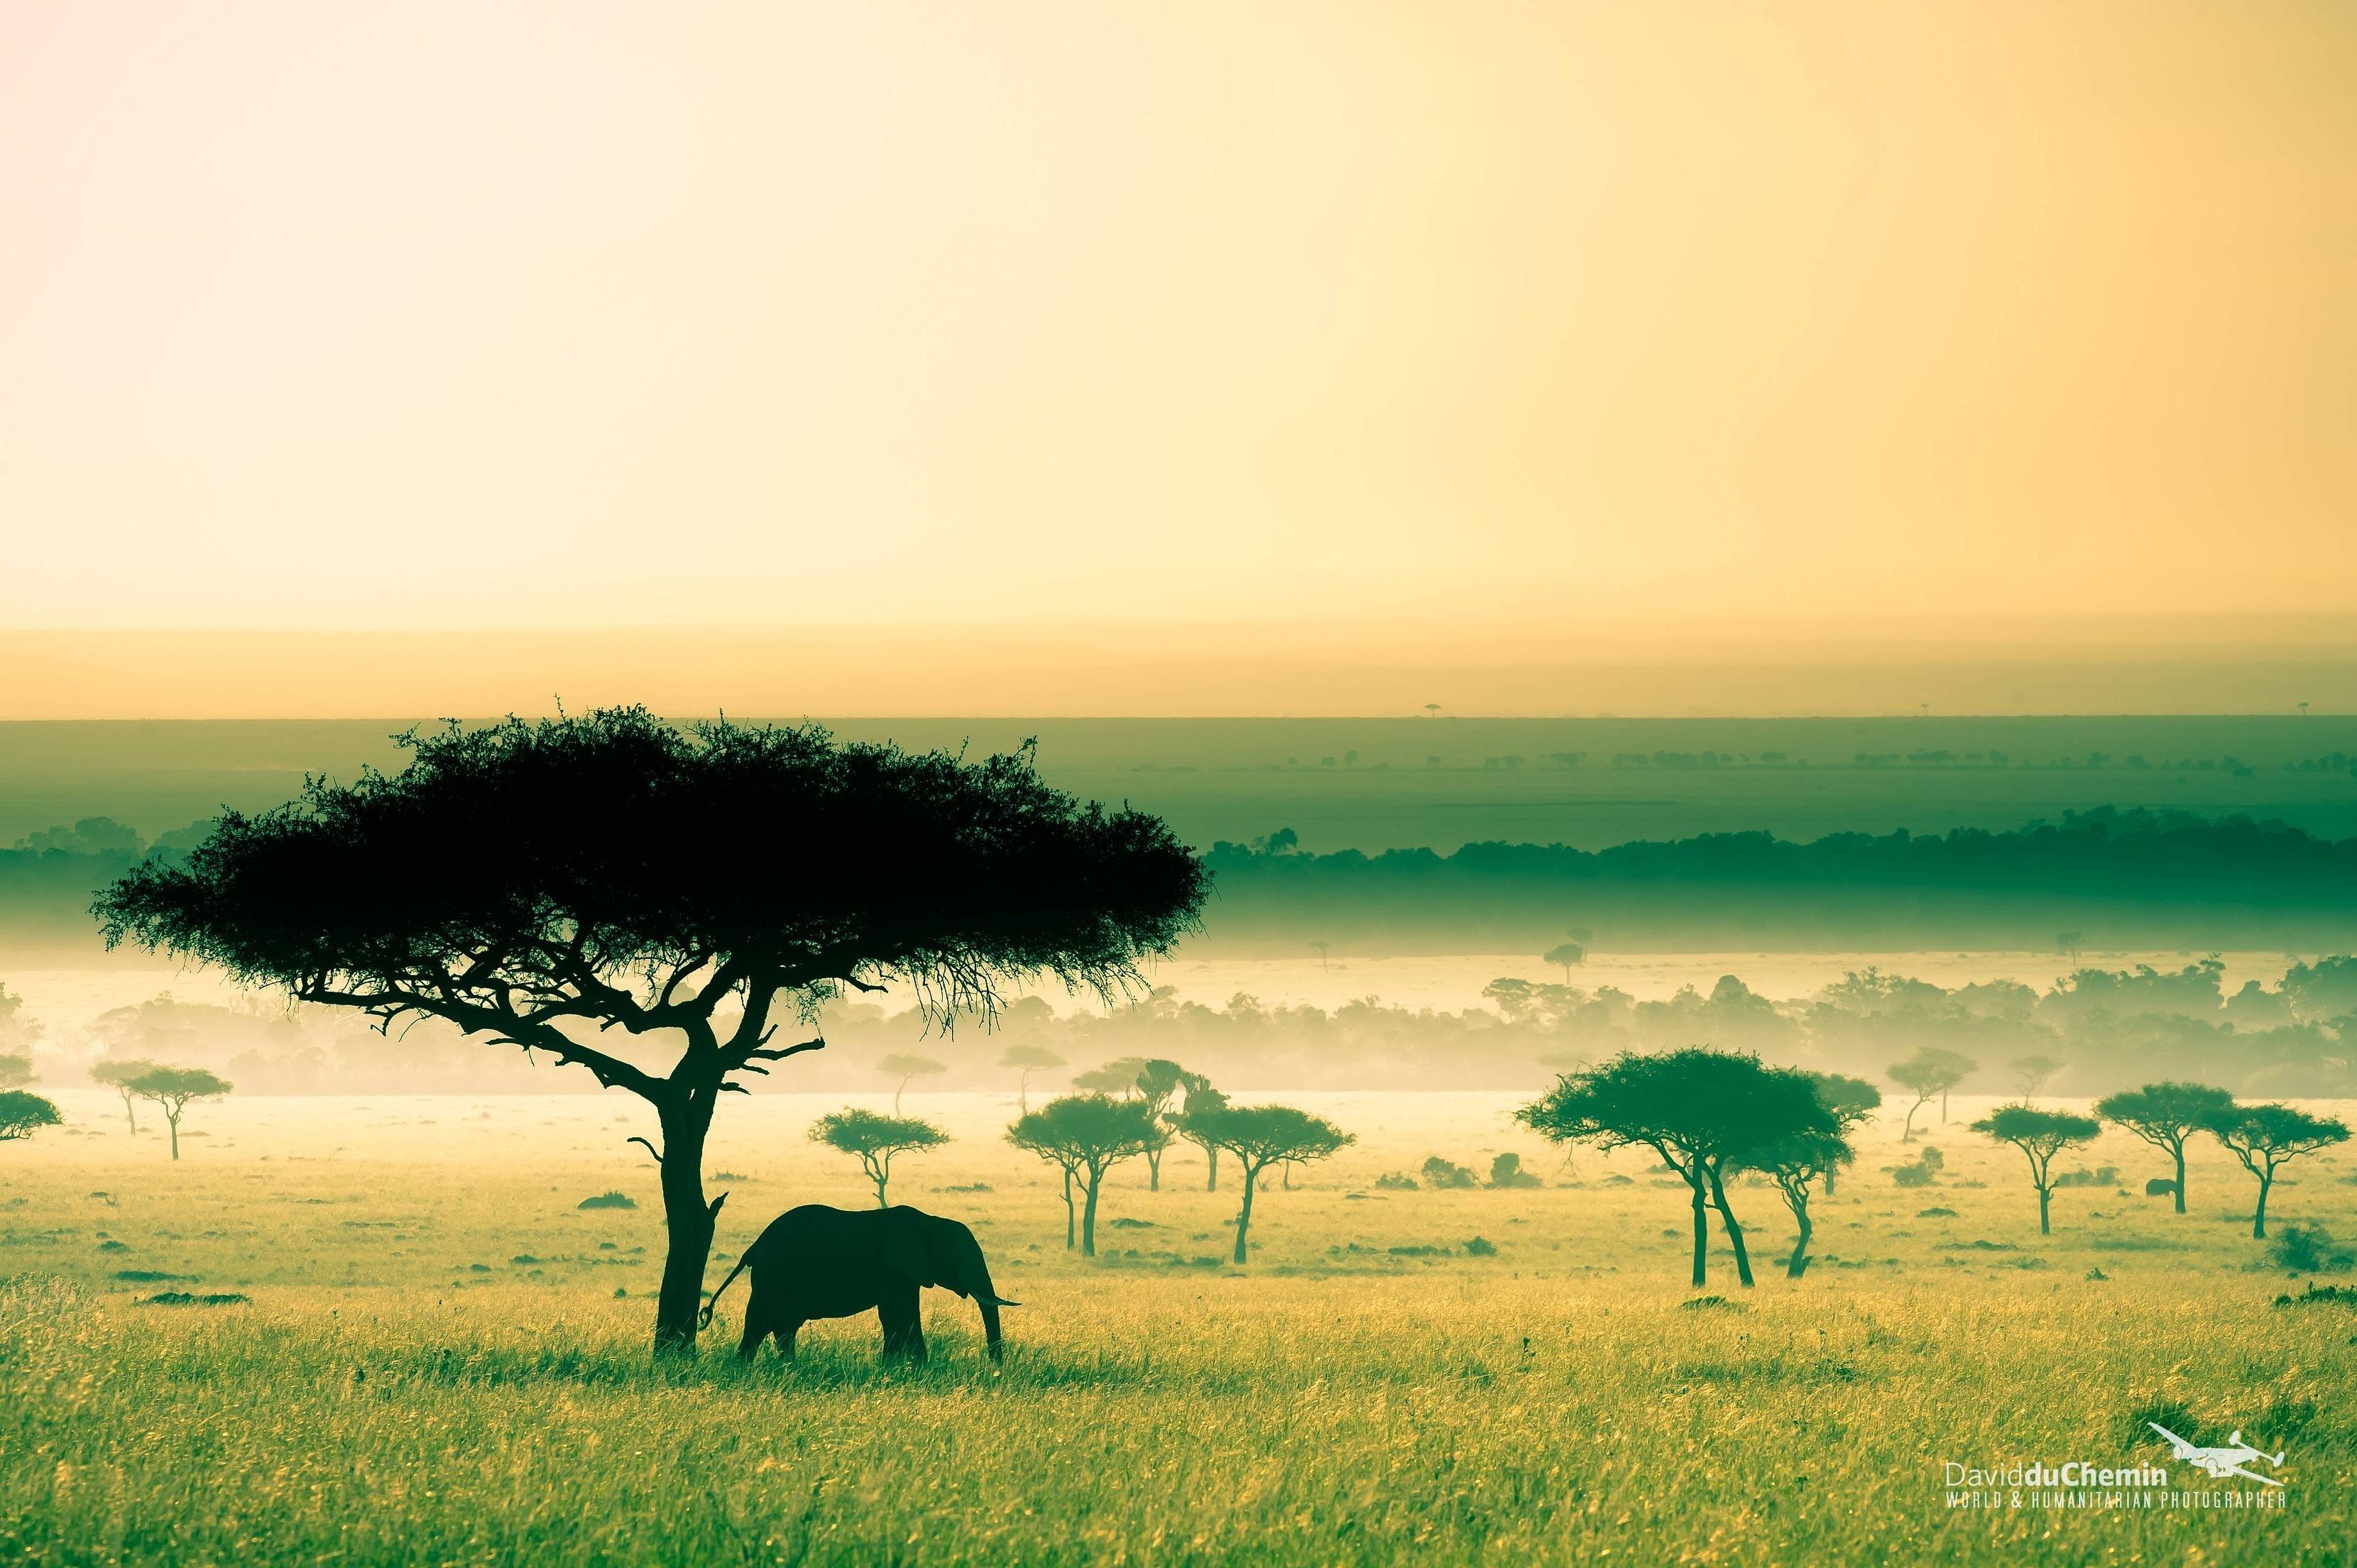 africa wallpaper,savanna,natural landscape,grassland,sky,wildlife